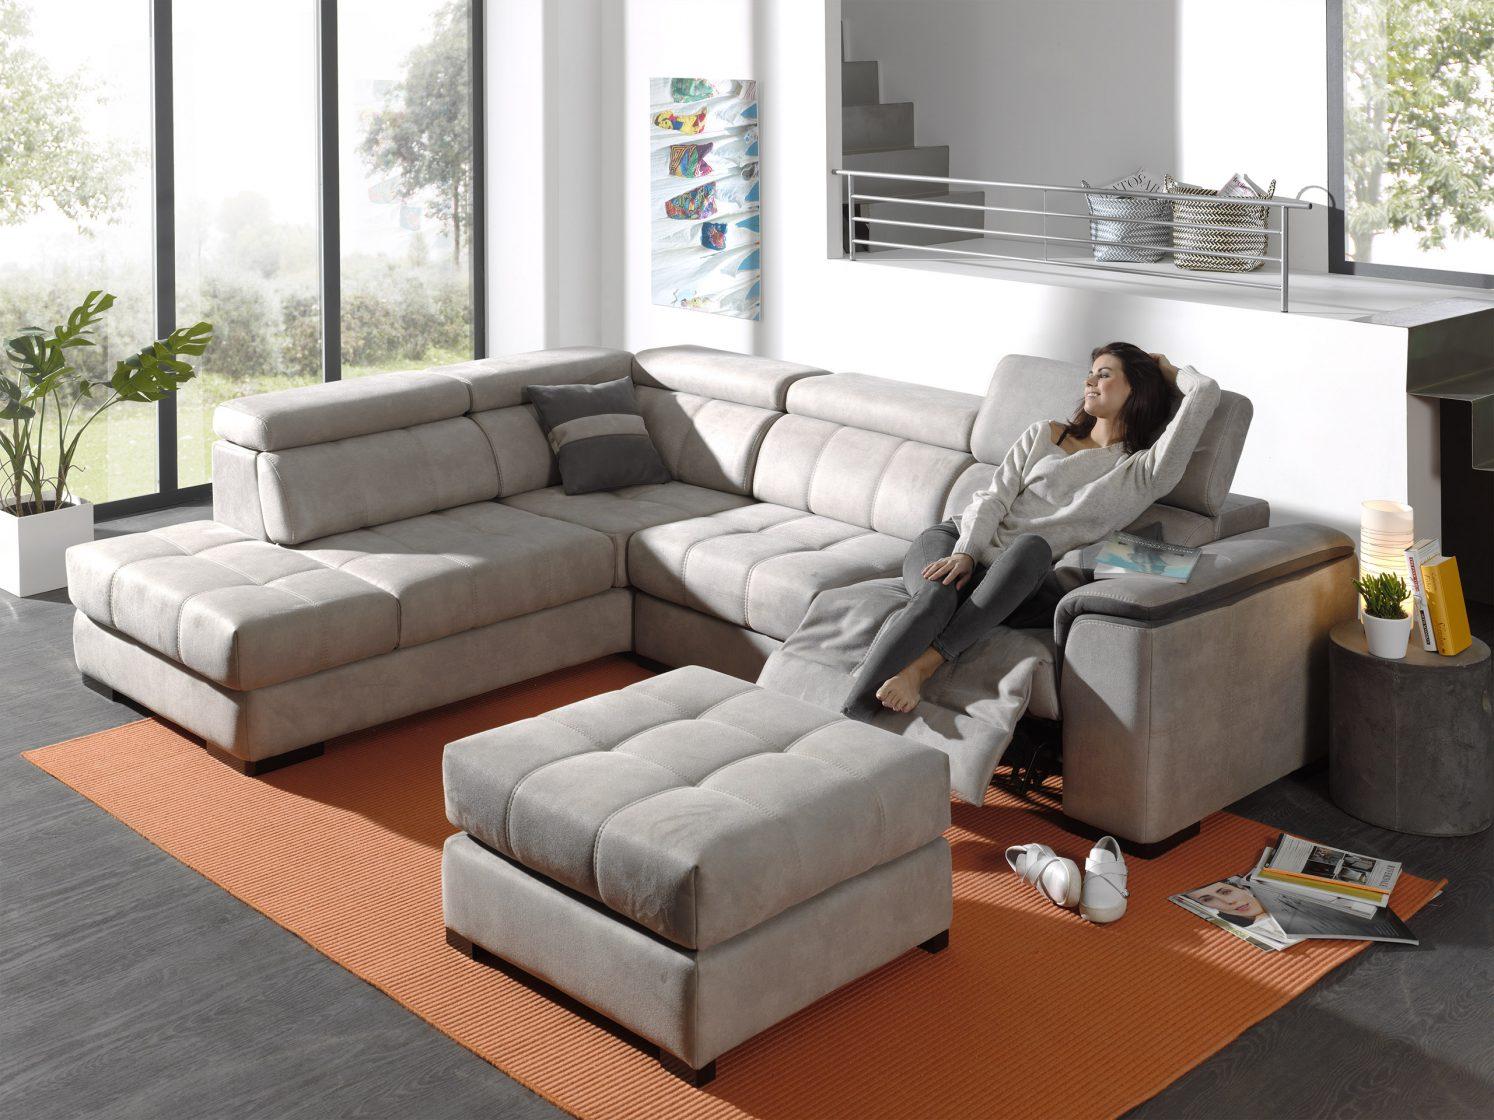 Canapé, canapé d'angle, canapé relax, pouf Riva